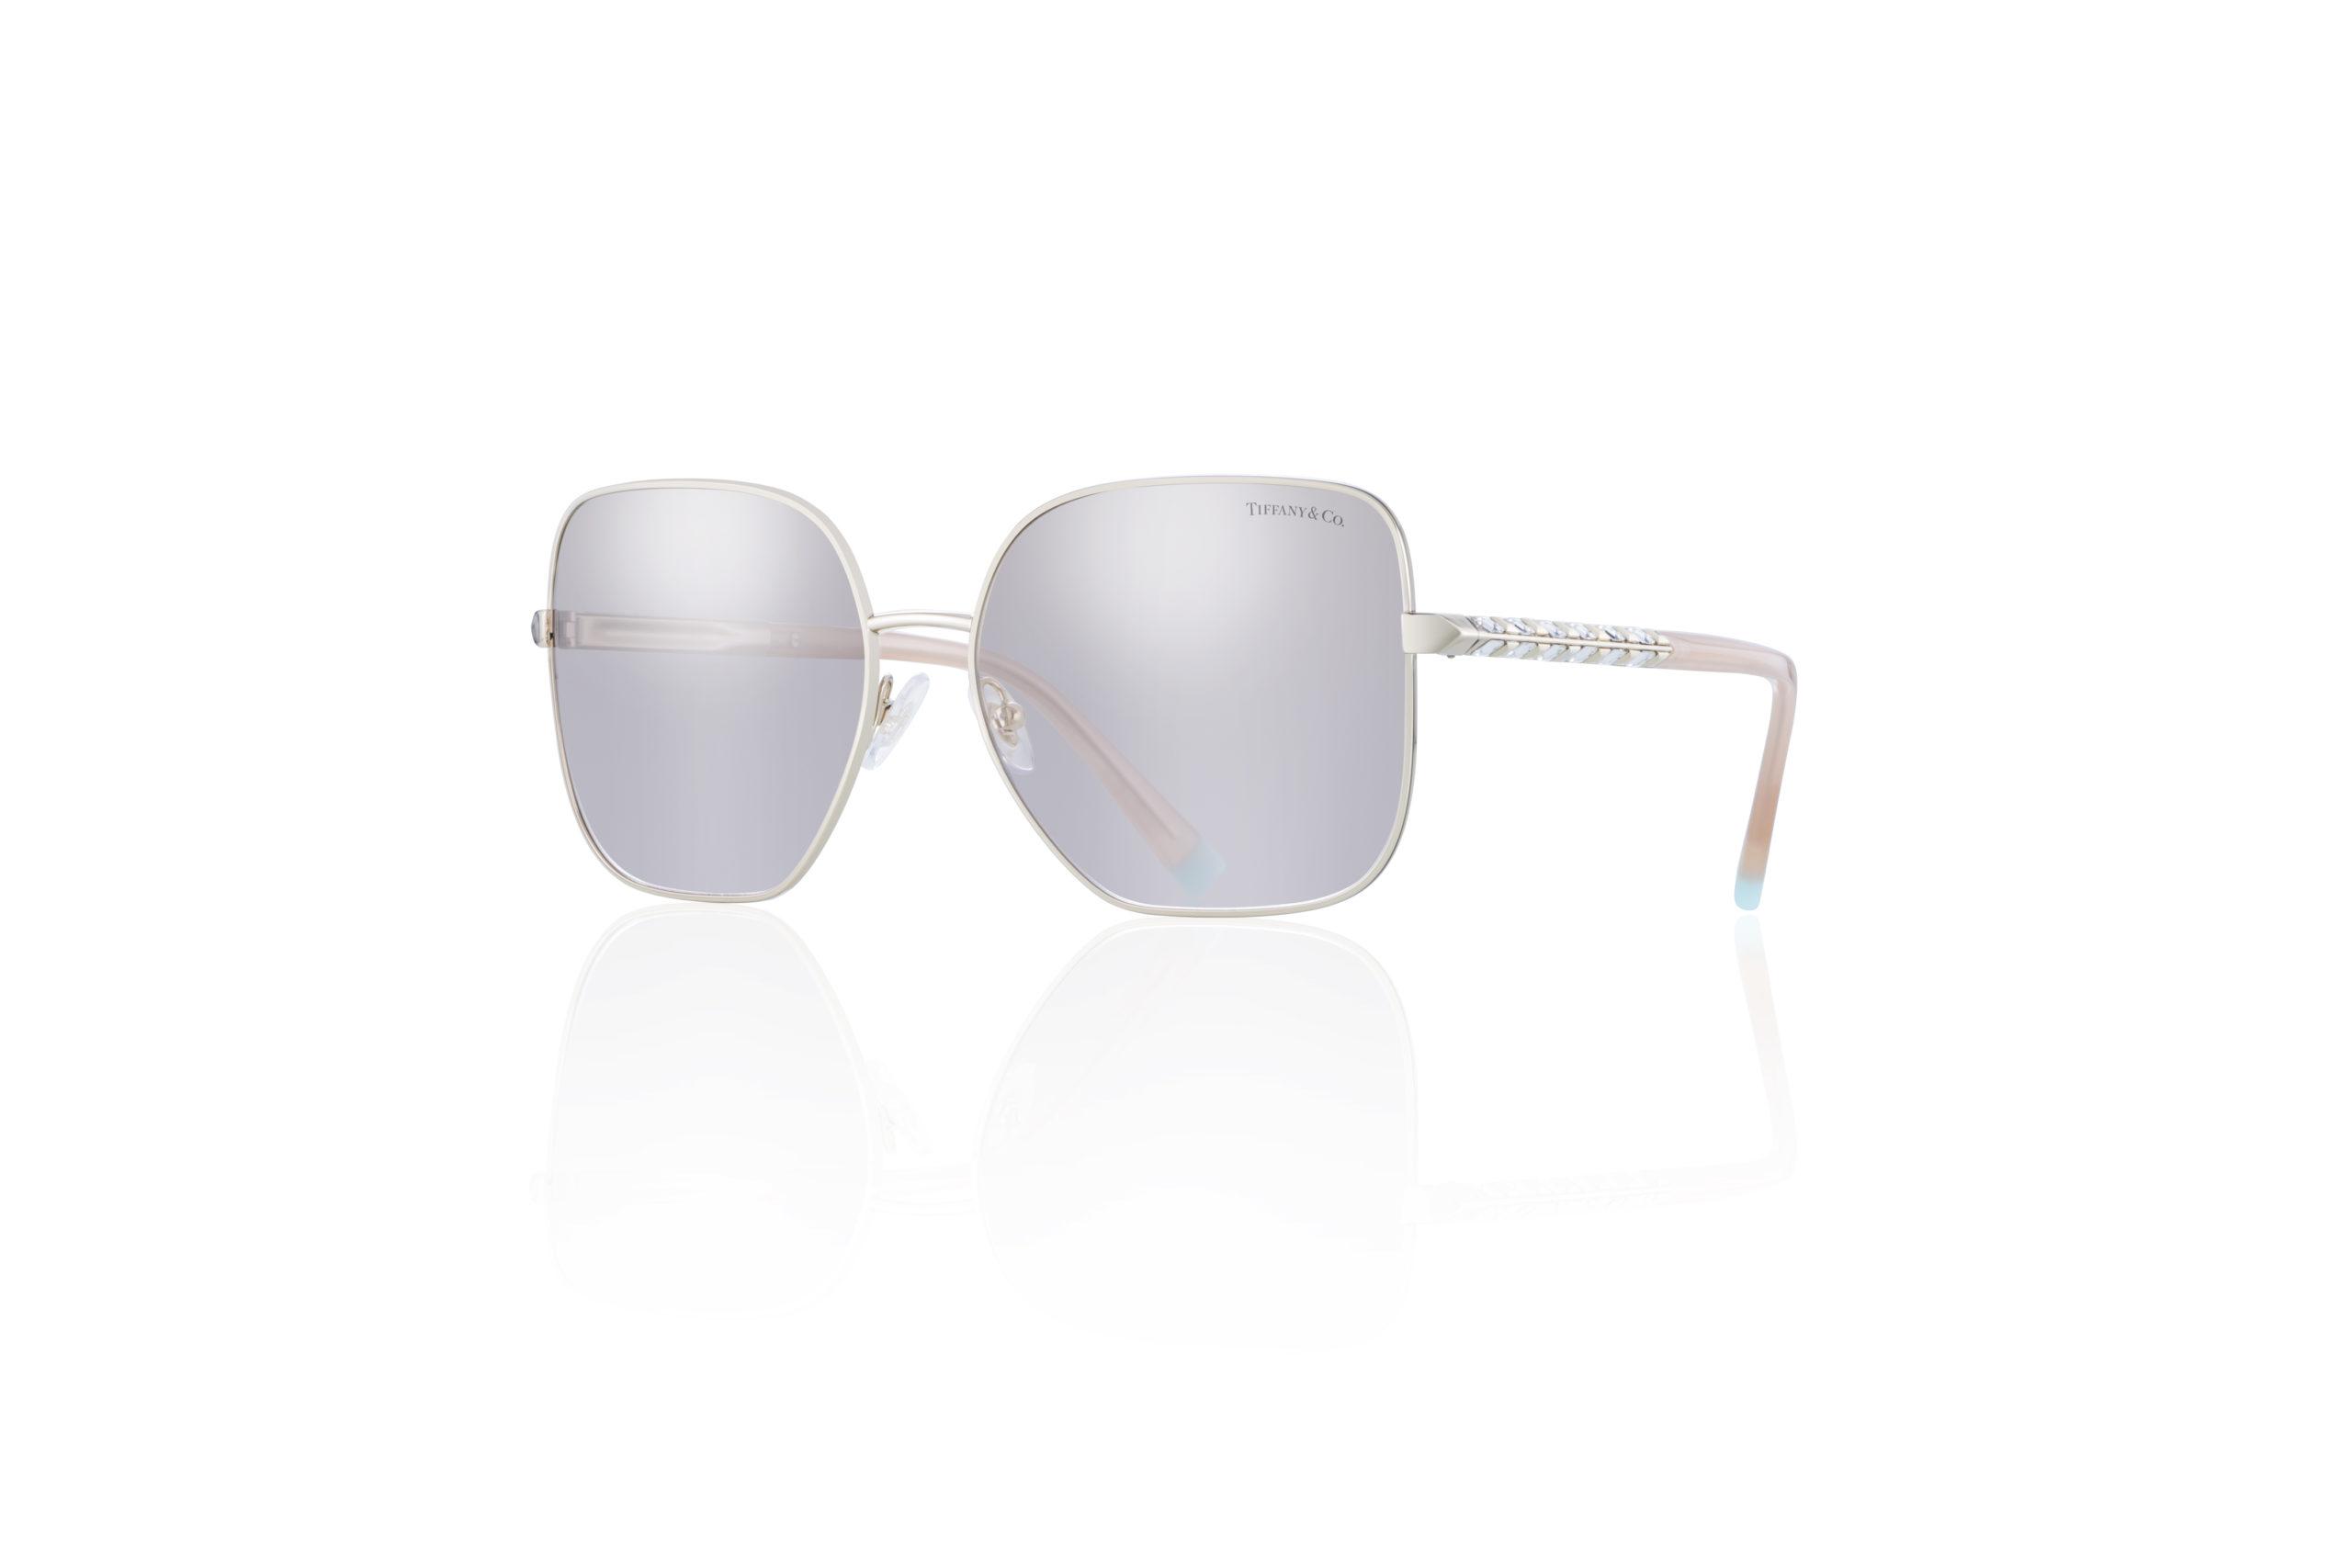 Tiffany-and-co-sunglasses-ss-21-edit